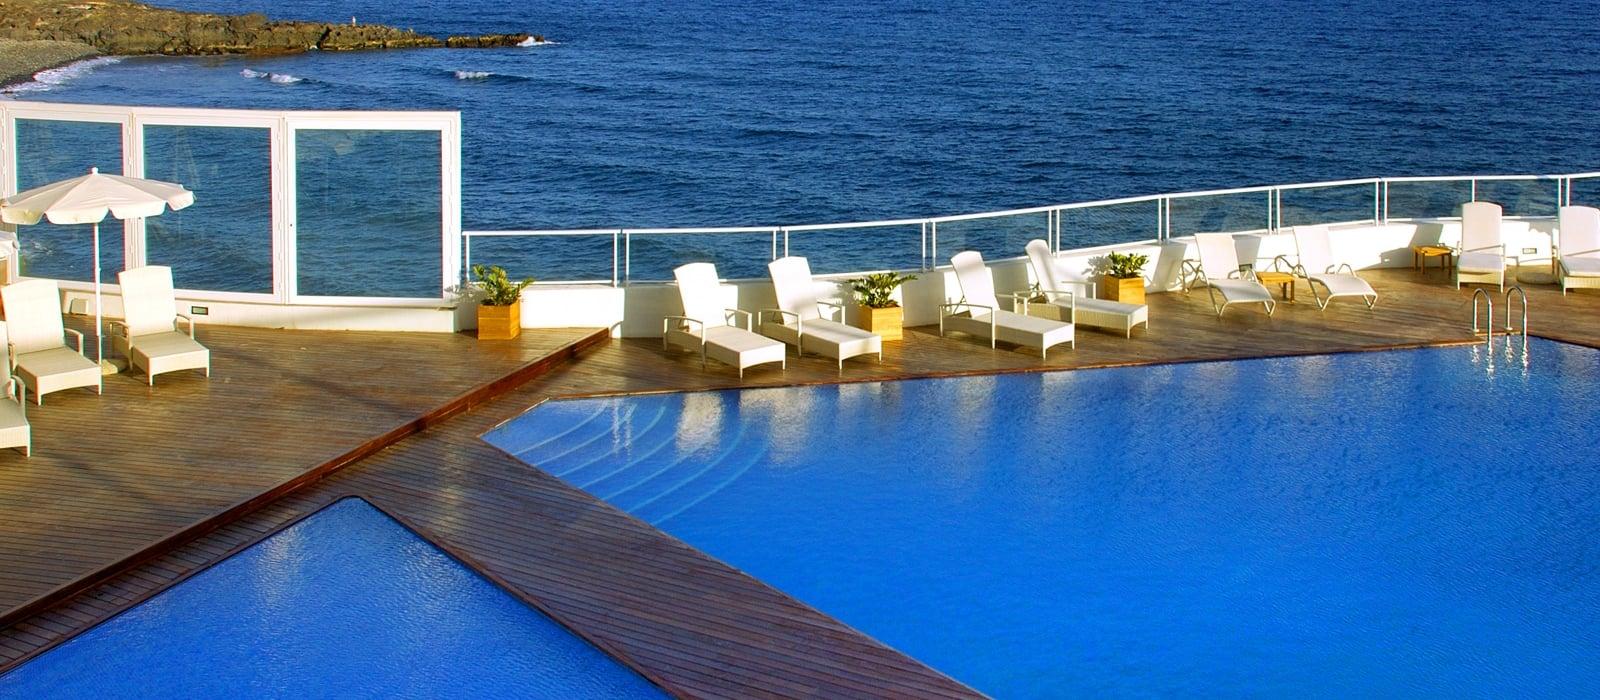 Photos And Videos Hotel Tenerife Golf Vincci Hotels